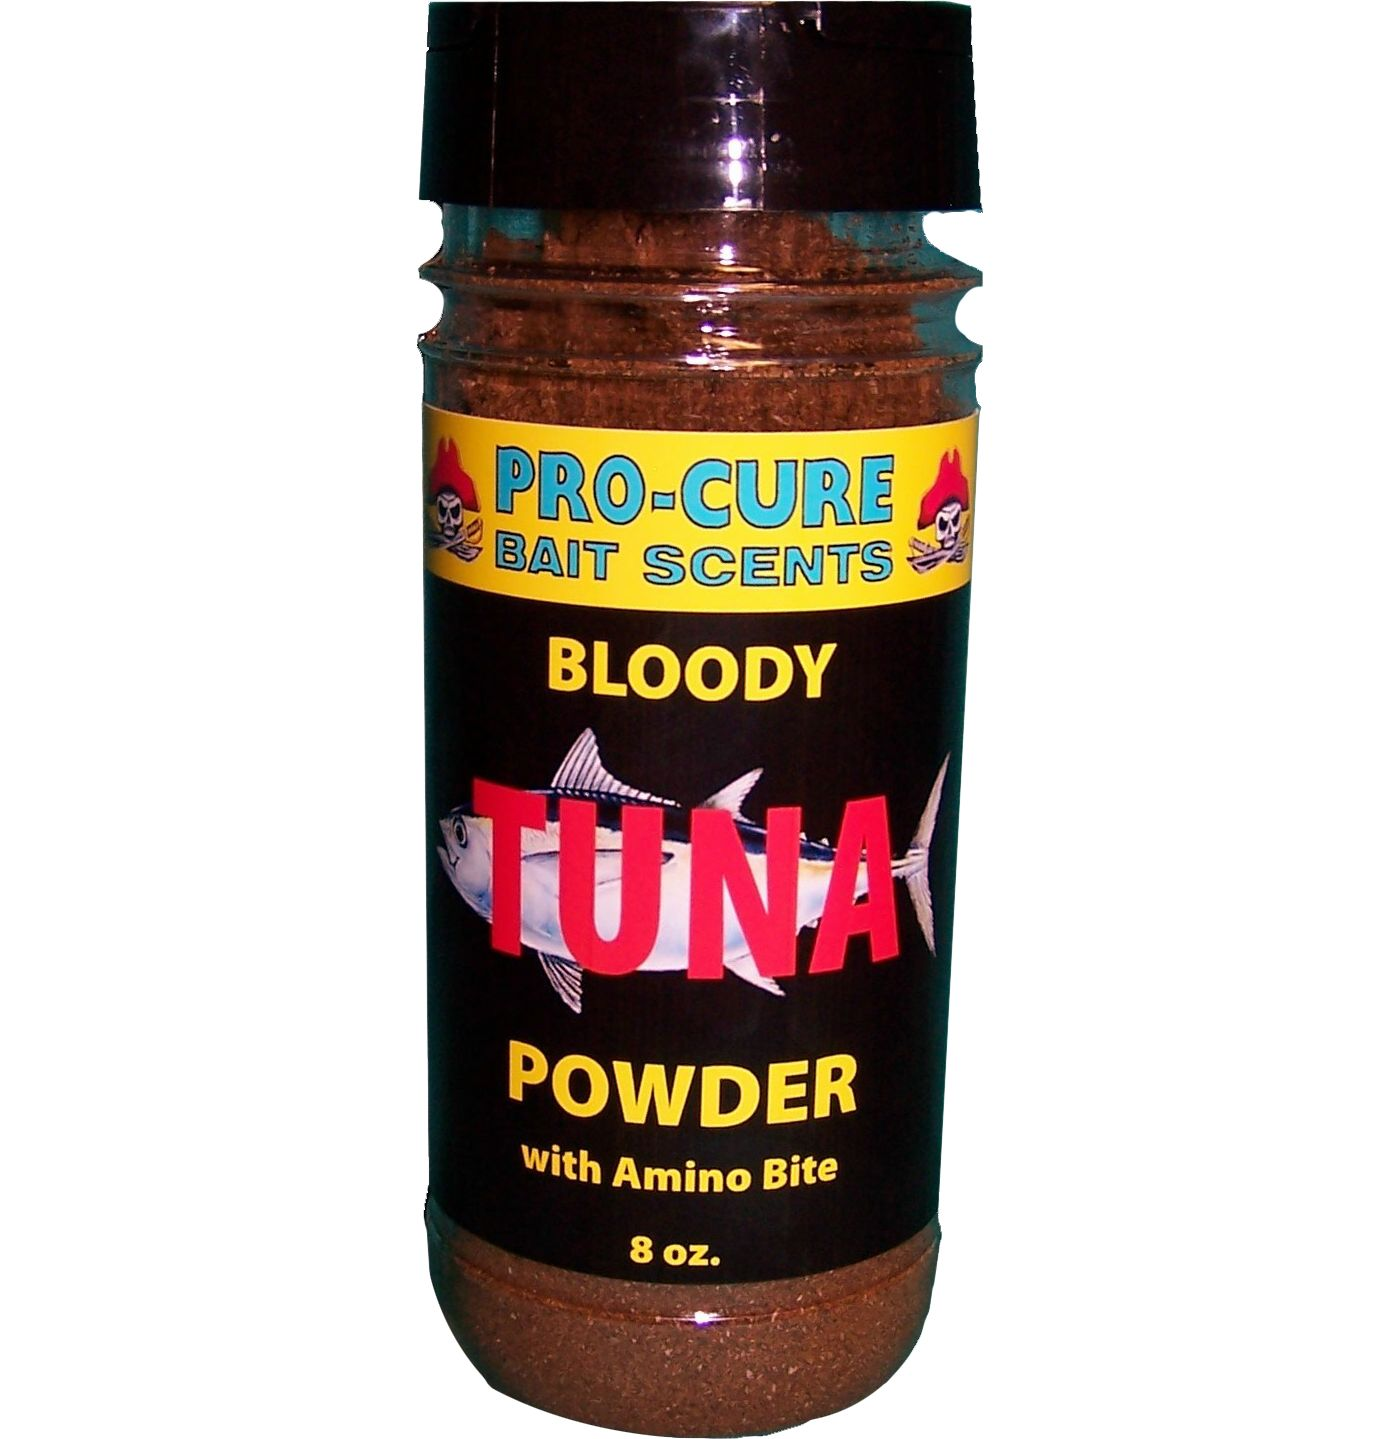 Pro-Cure Bloody Tuna Powder Fish Attractant